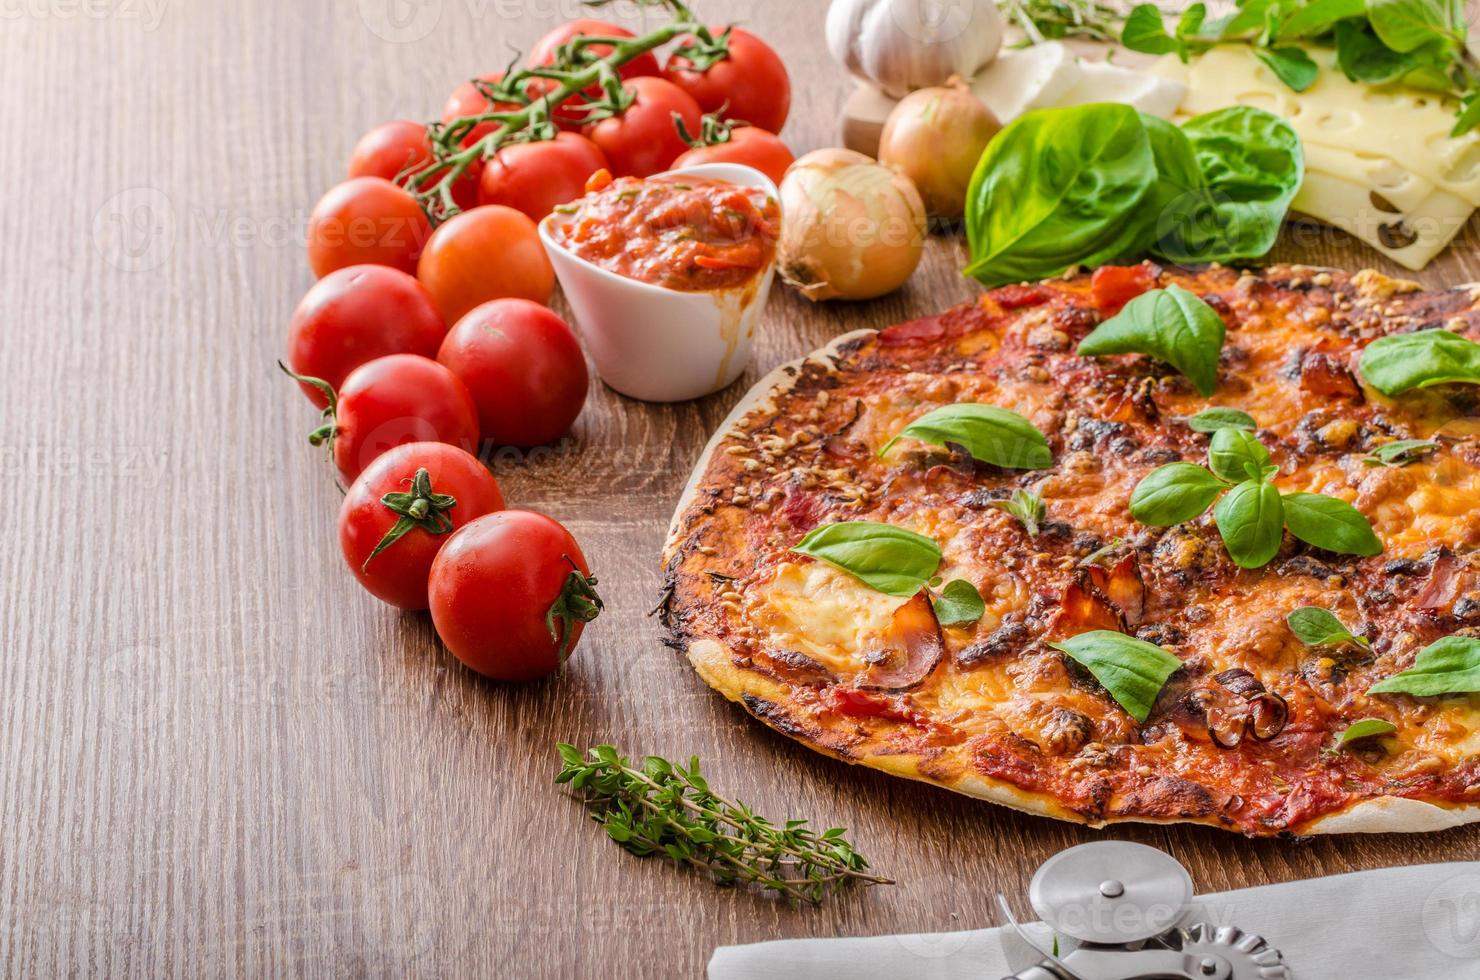 kaaspizza met chili en basilicum foto